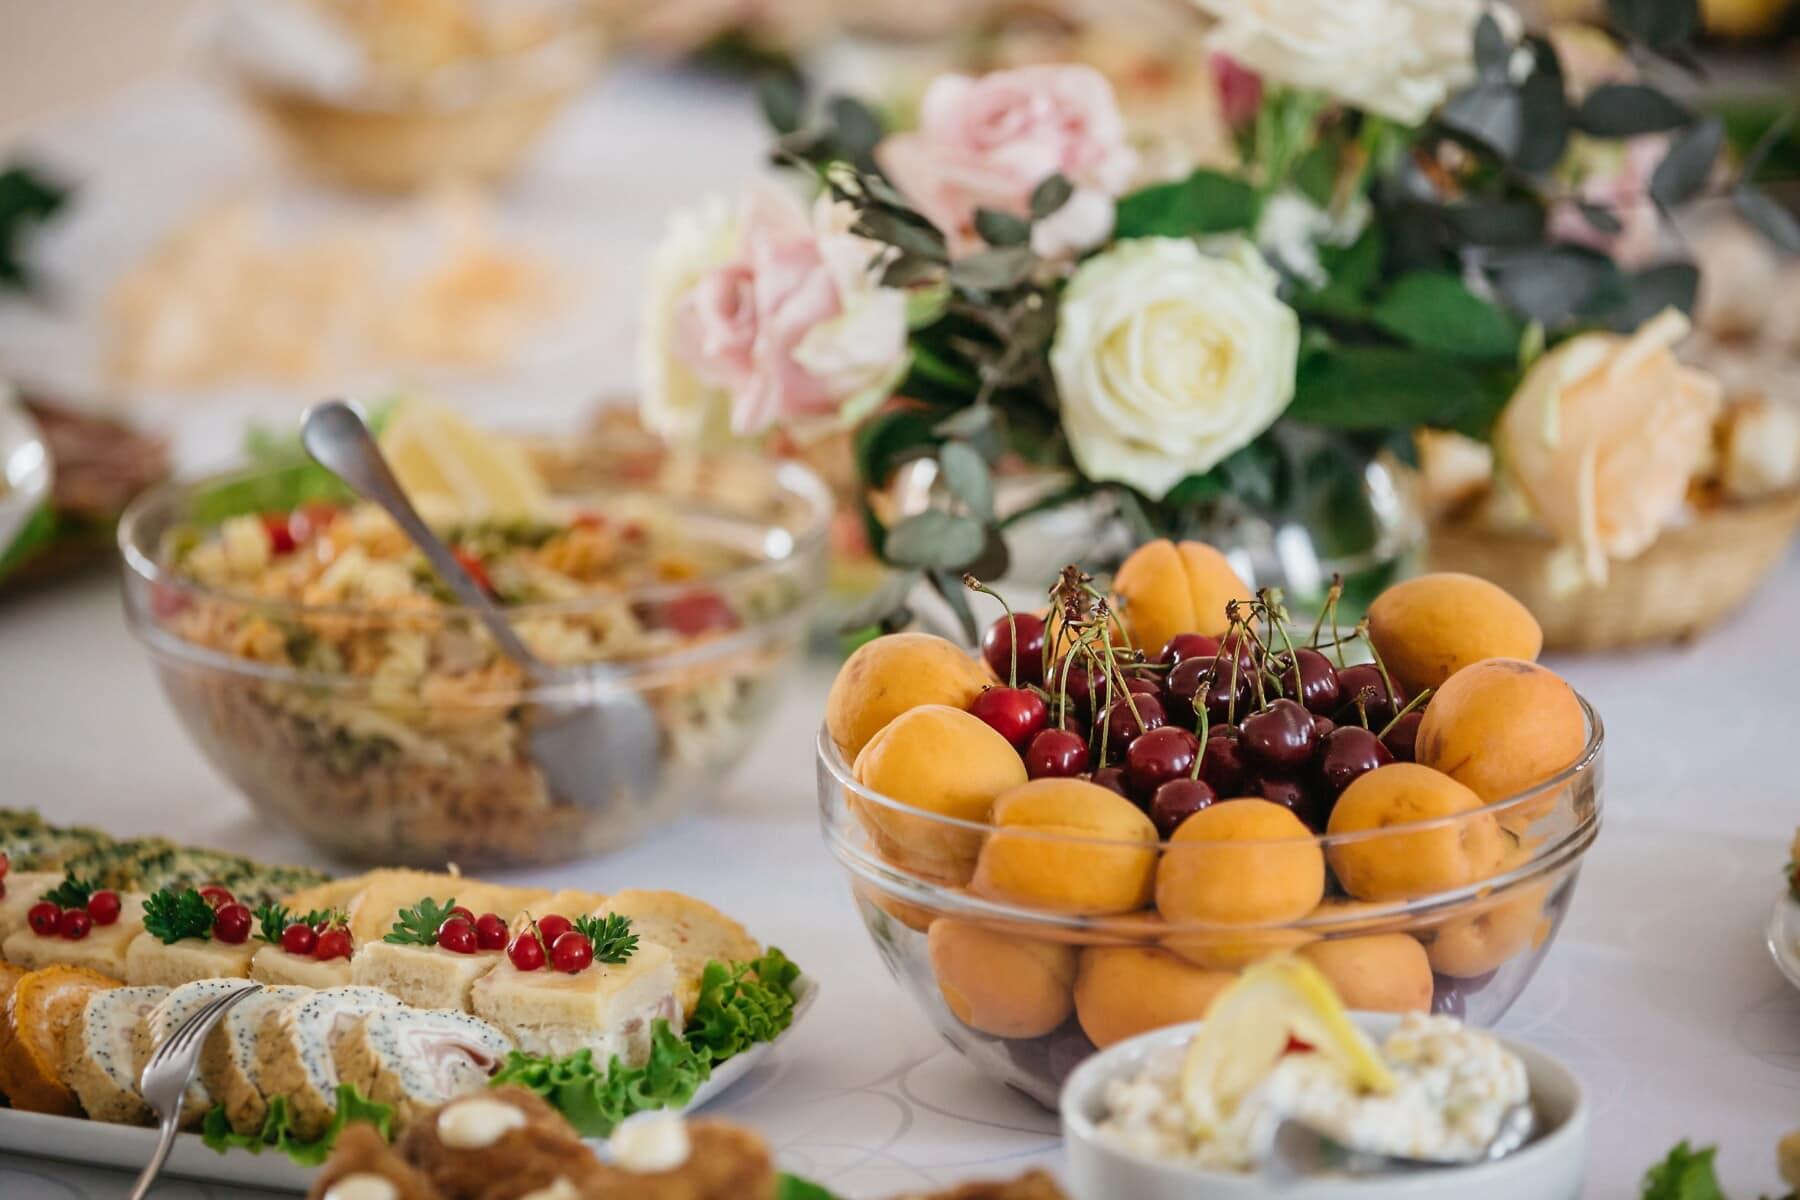 cerejas, tigela, pêssego, para banquetes, aperitivo, lanche, buffet de, almoço, comida, jantar